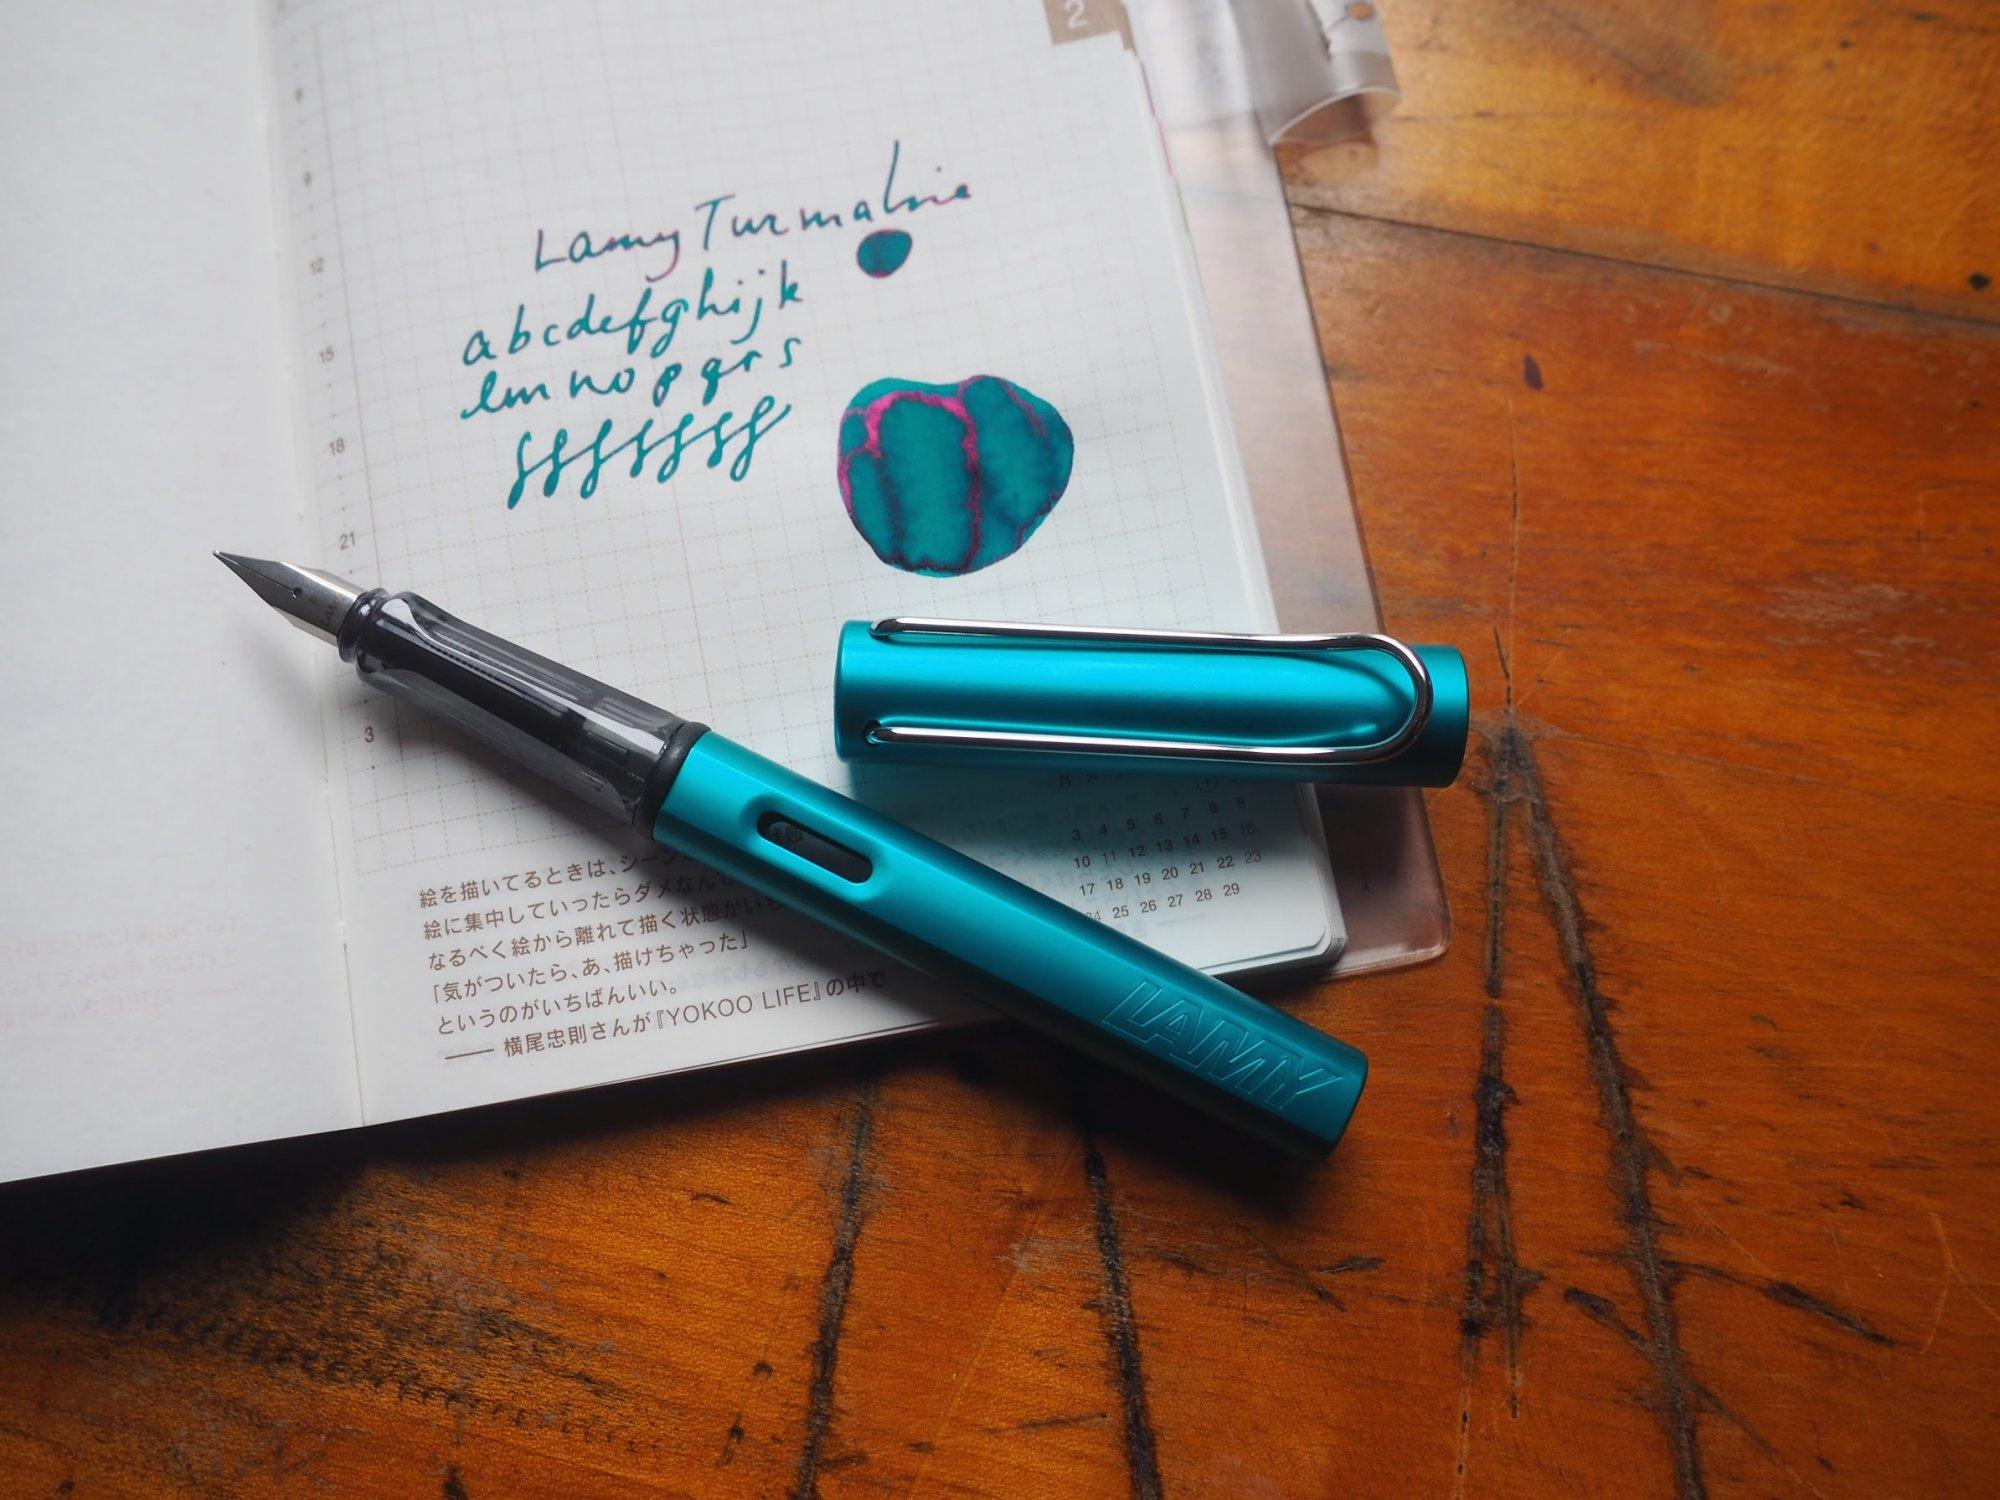 LAMY AL-StarFountain Pen - Turmaline (Special Edition) Medium Nib